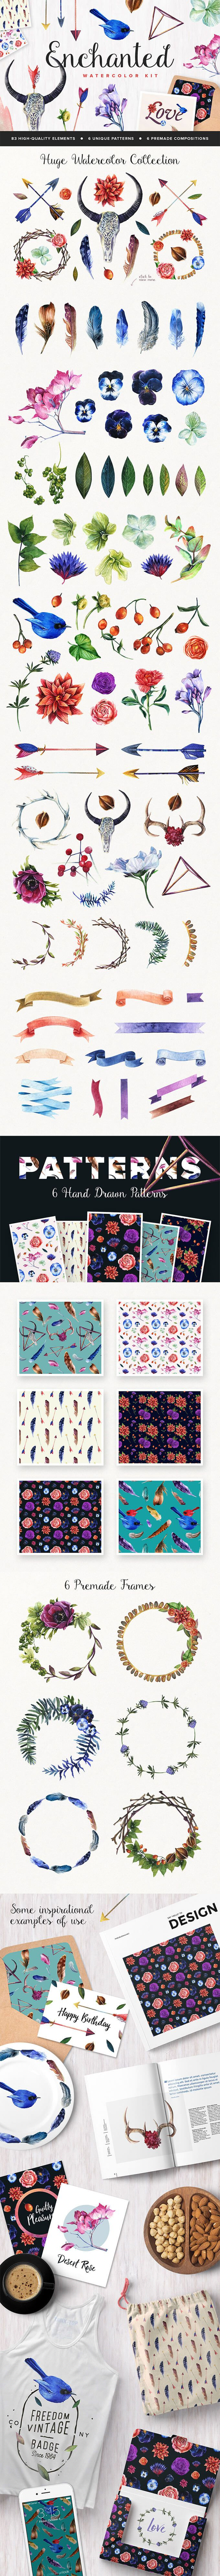 creative-designers-illustration-kit-2a